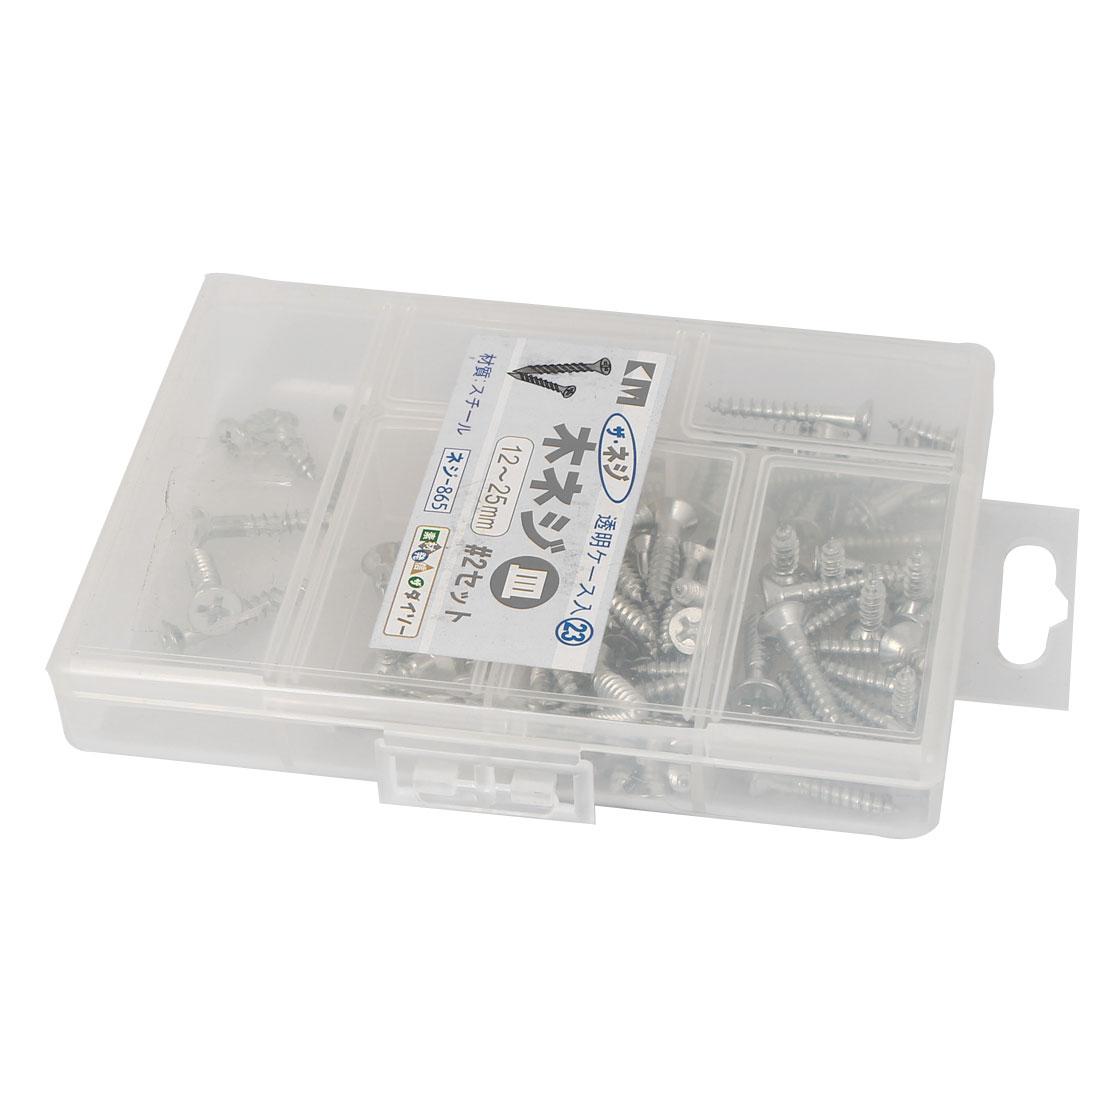 12mm-25mm Self Tapping  Flat Head Sheet Metal Screws 85pcs - image 2 of 4